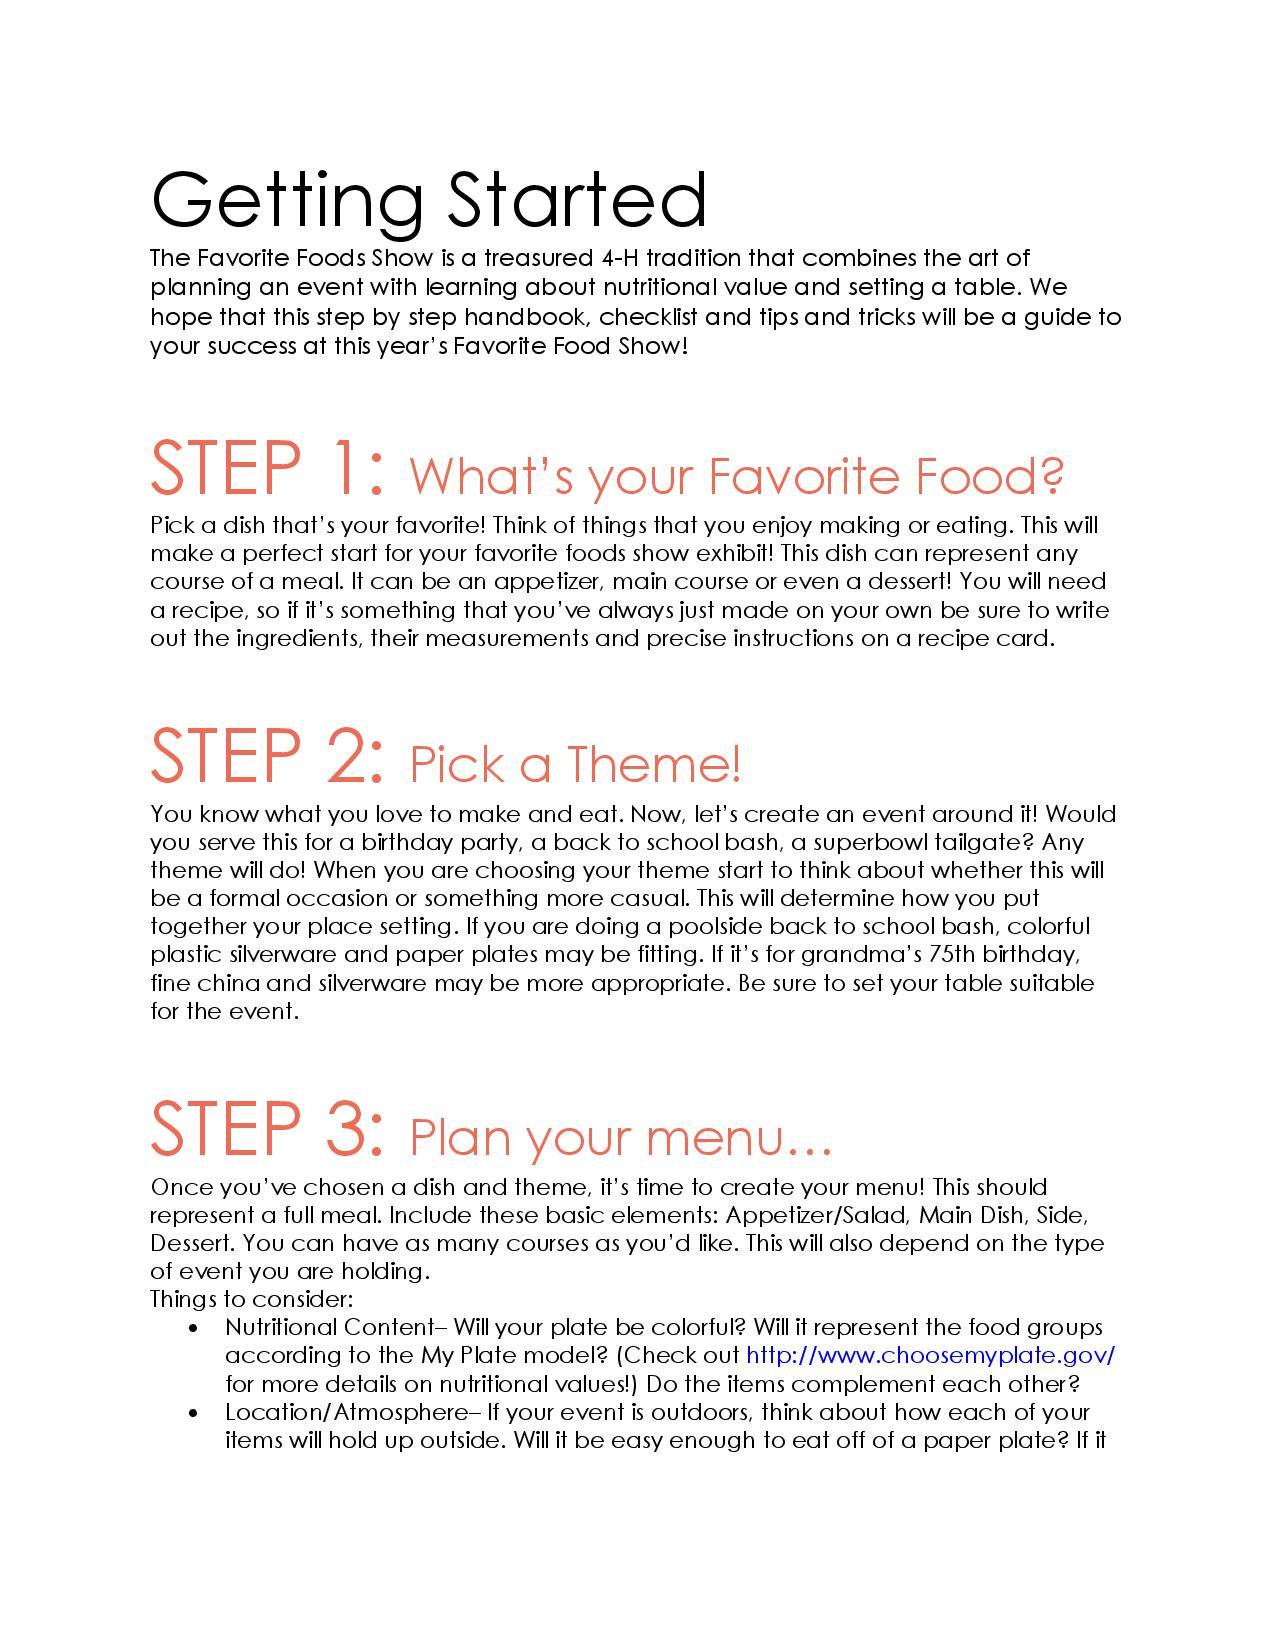 Favorite Foods Shoe Handbook page 2 image